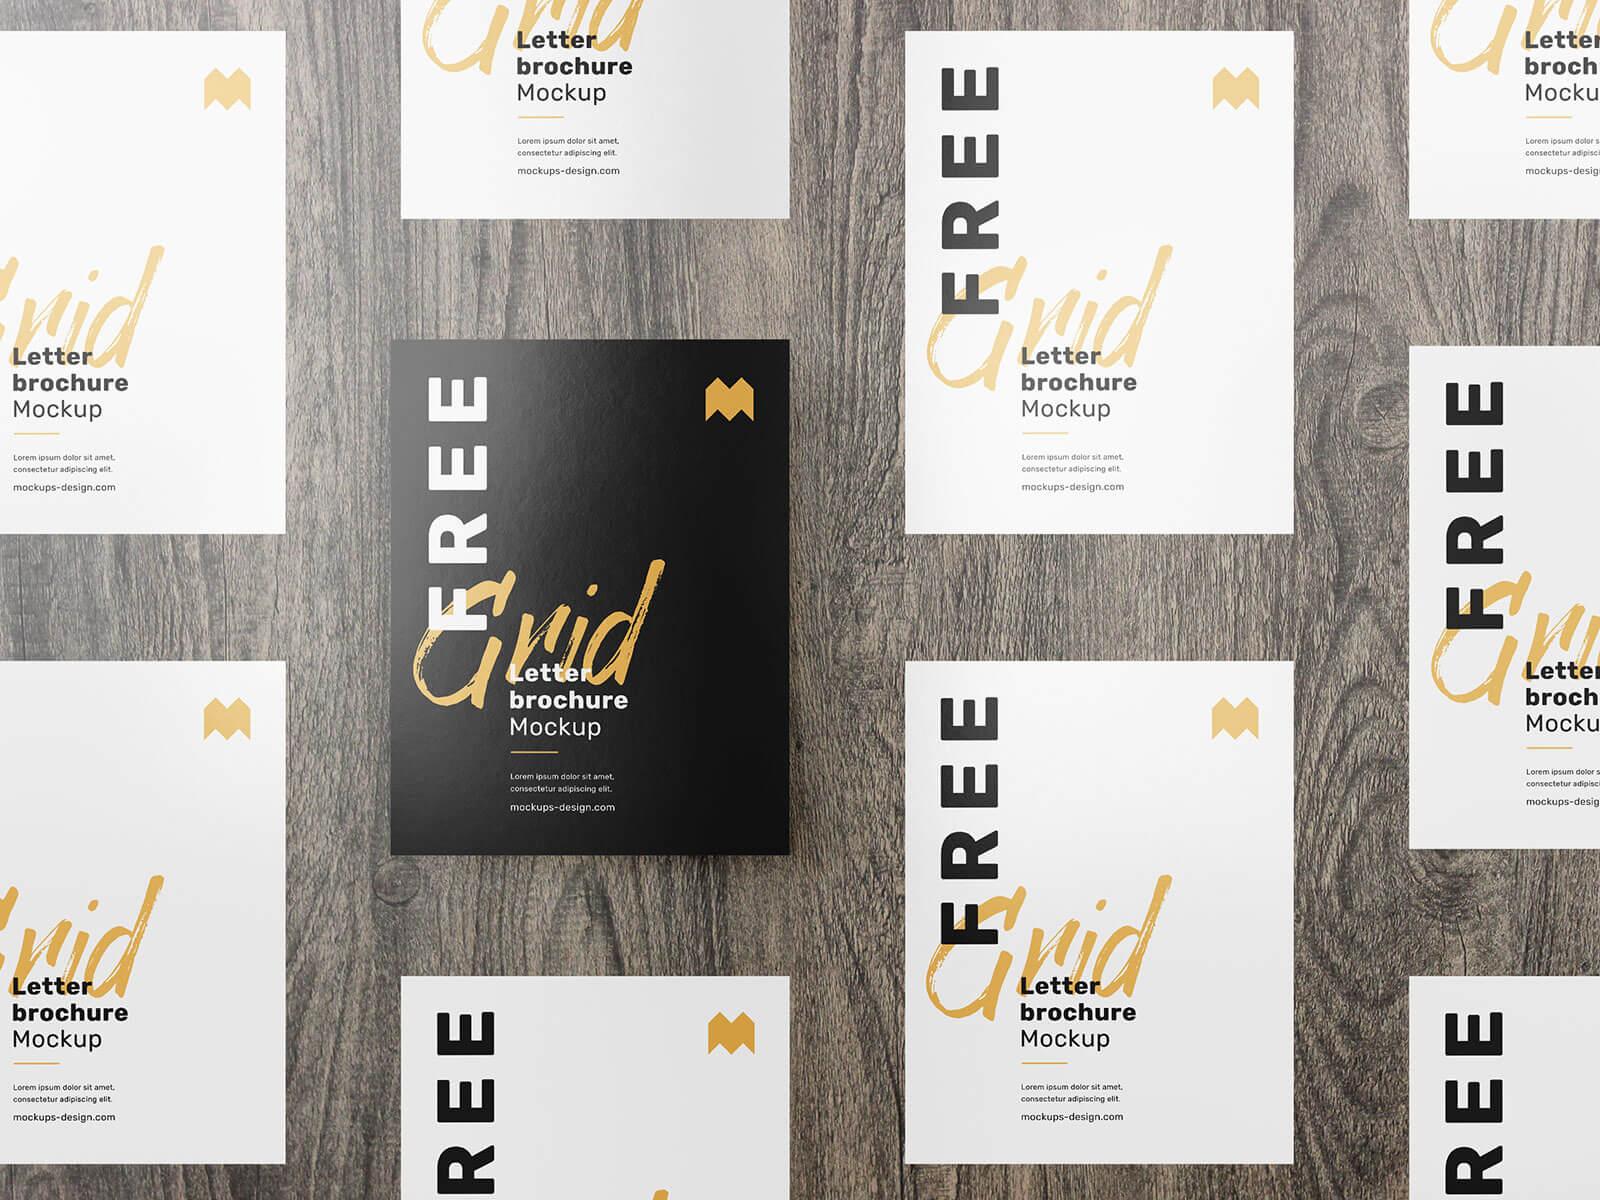 Free_Double Sided US_Letter_Brochure_Flyer Mockup_PSD Set (3)